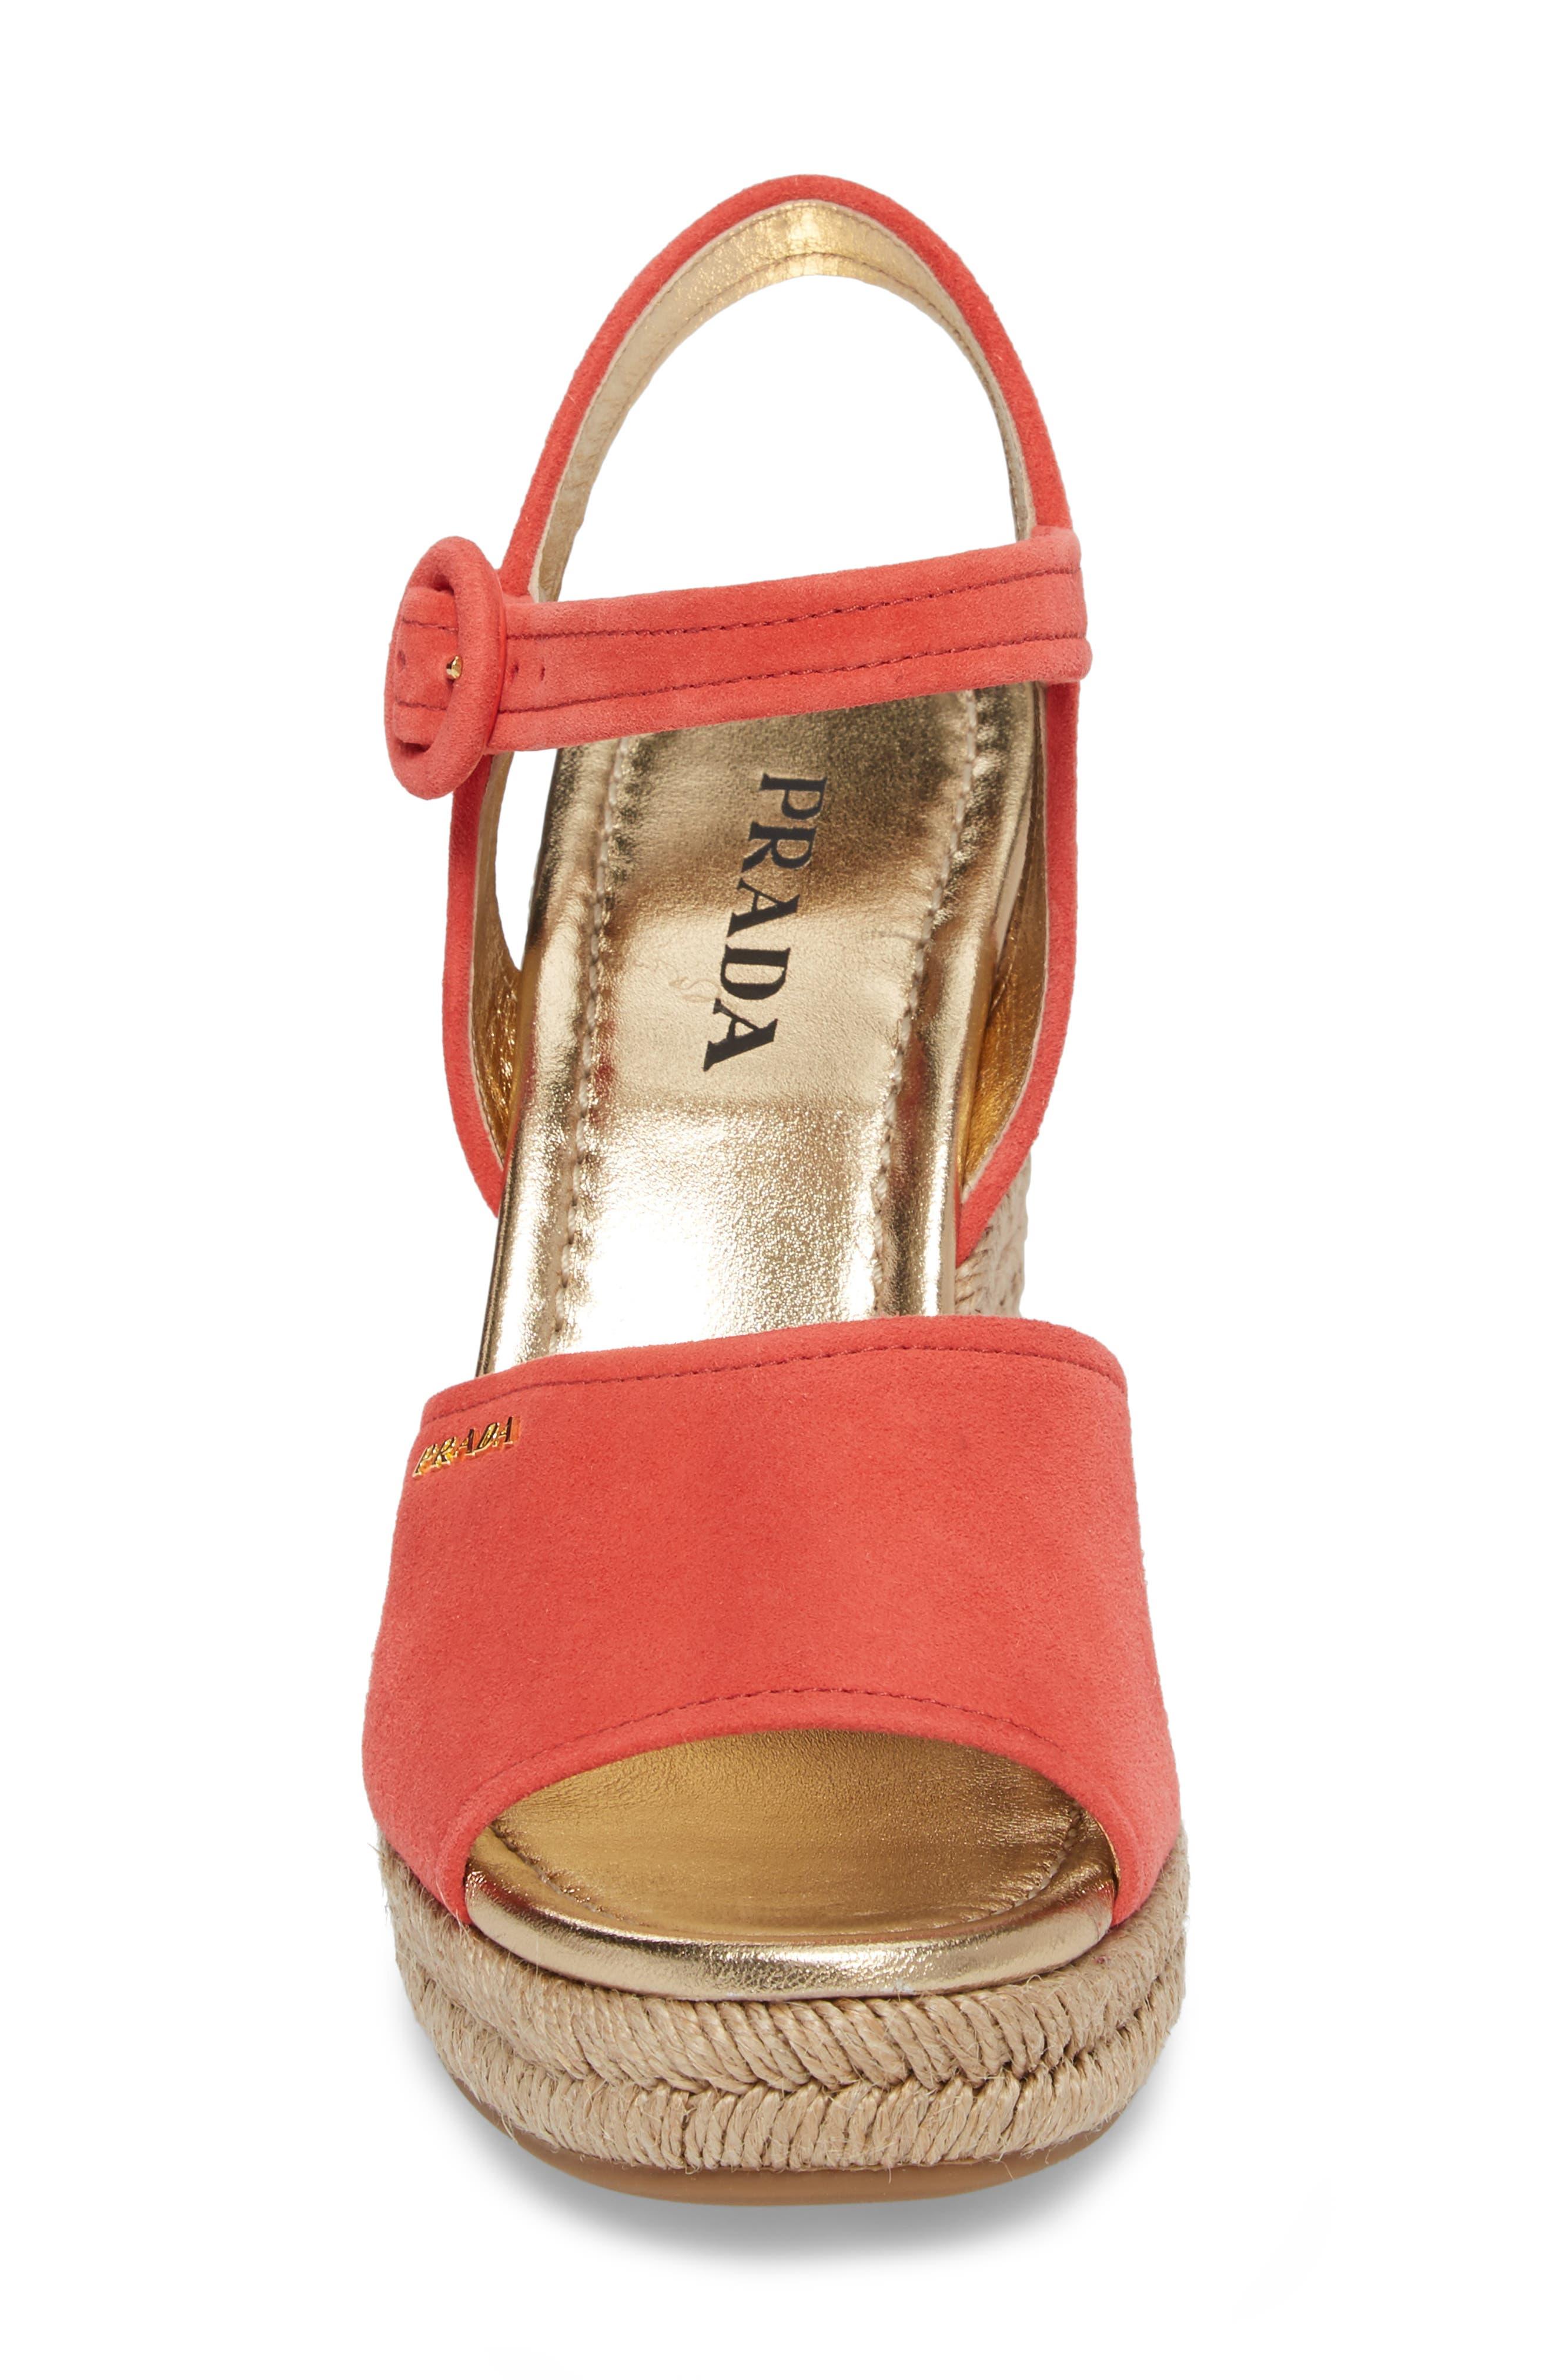 Espadrille Wedge Sandal,                             Alternate thumbnail 4, color,                             Red